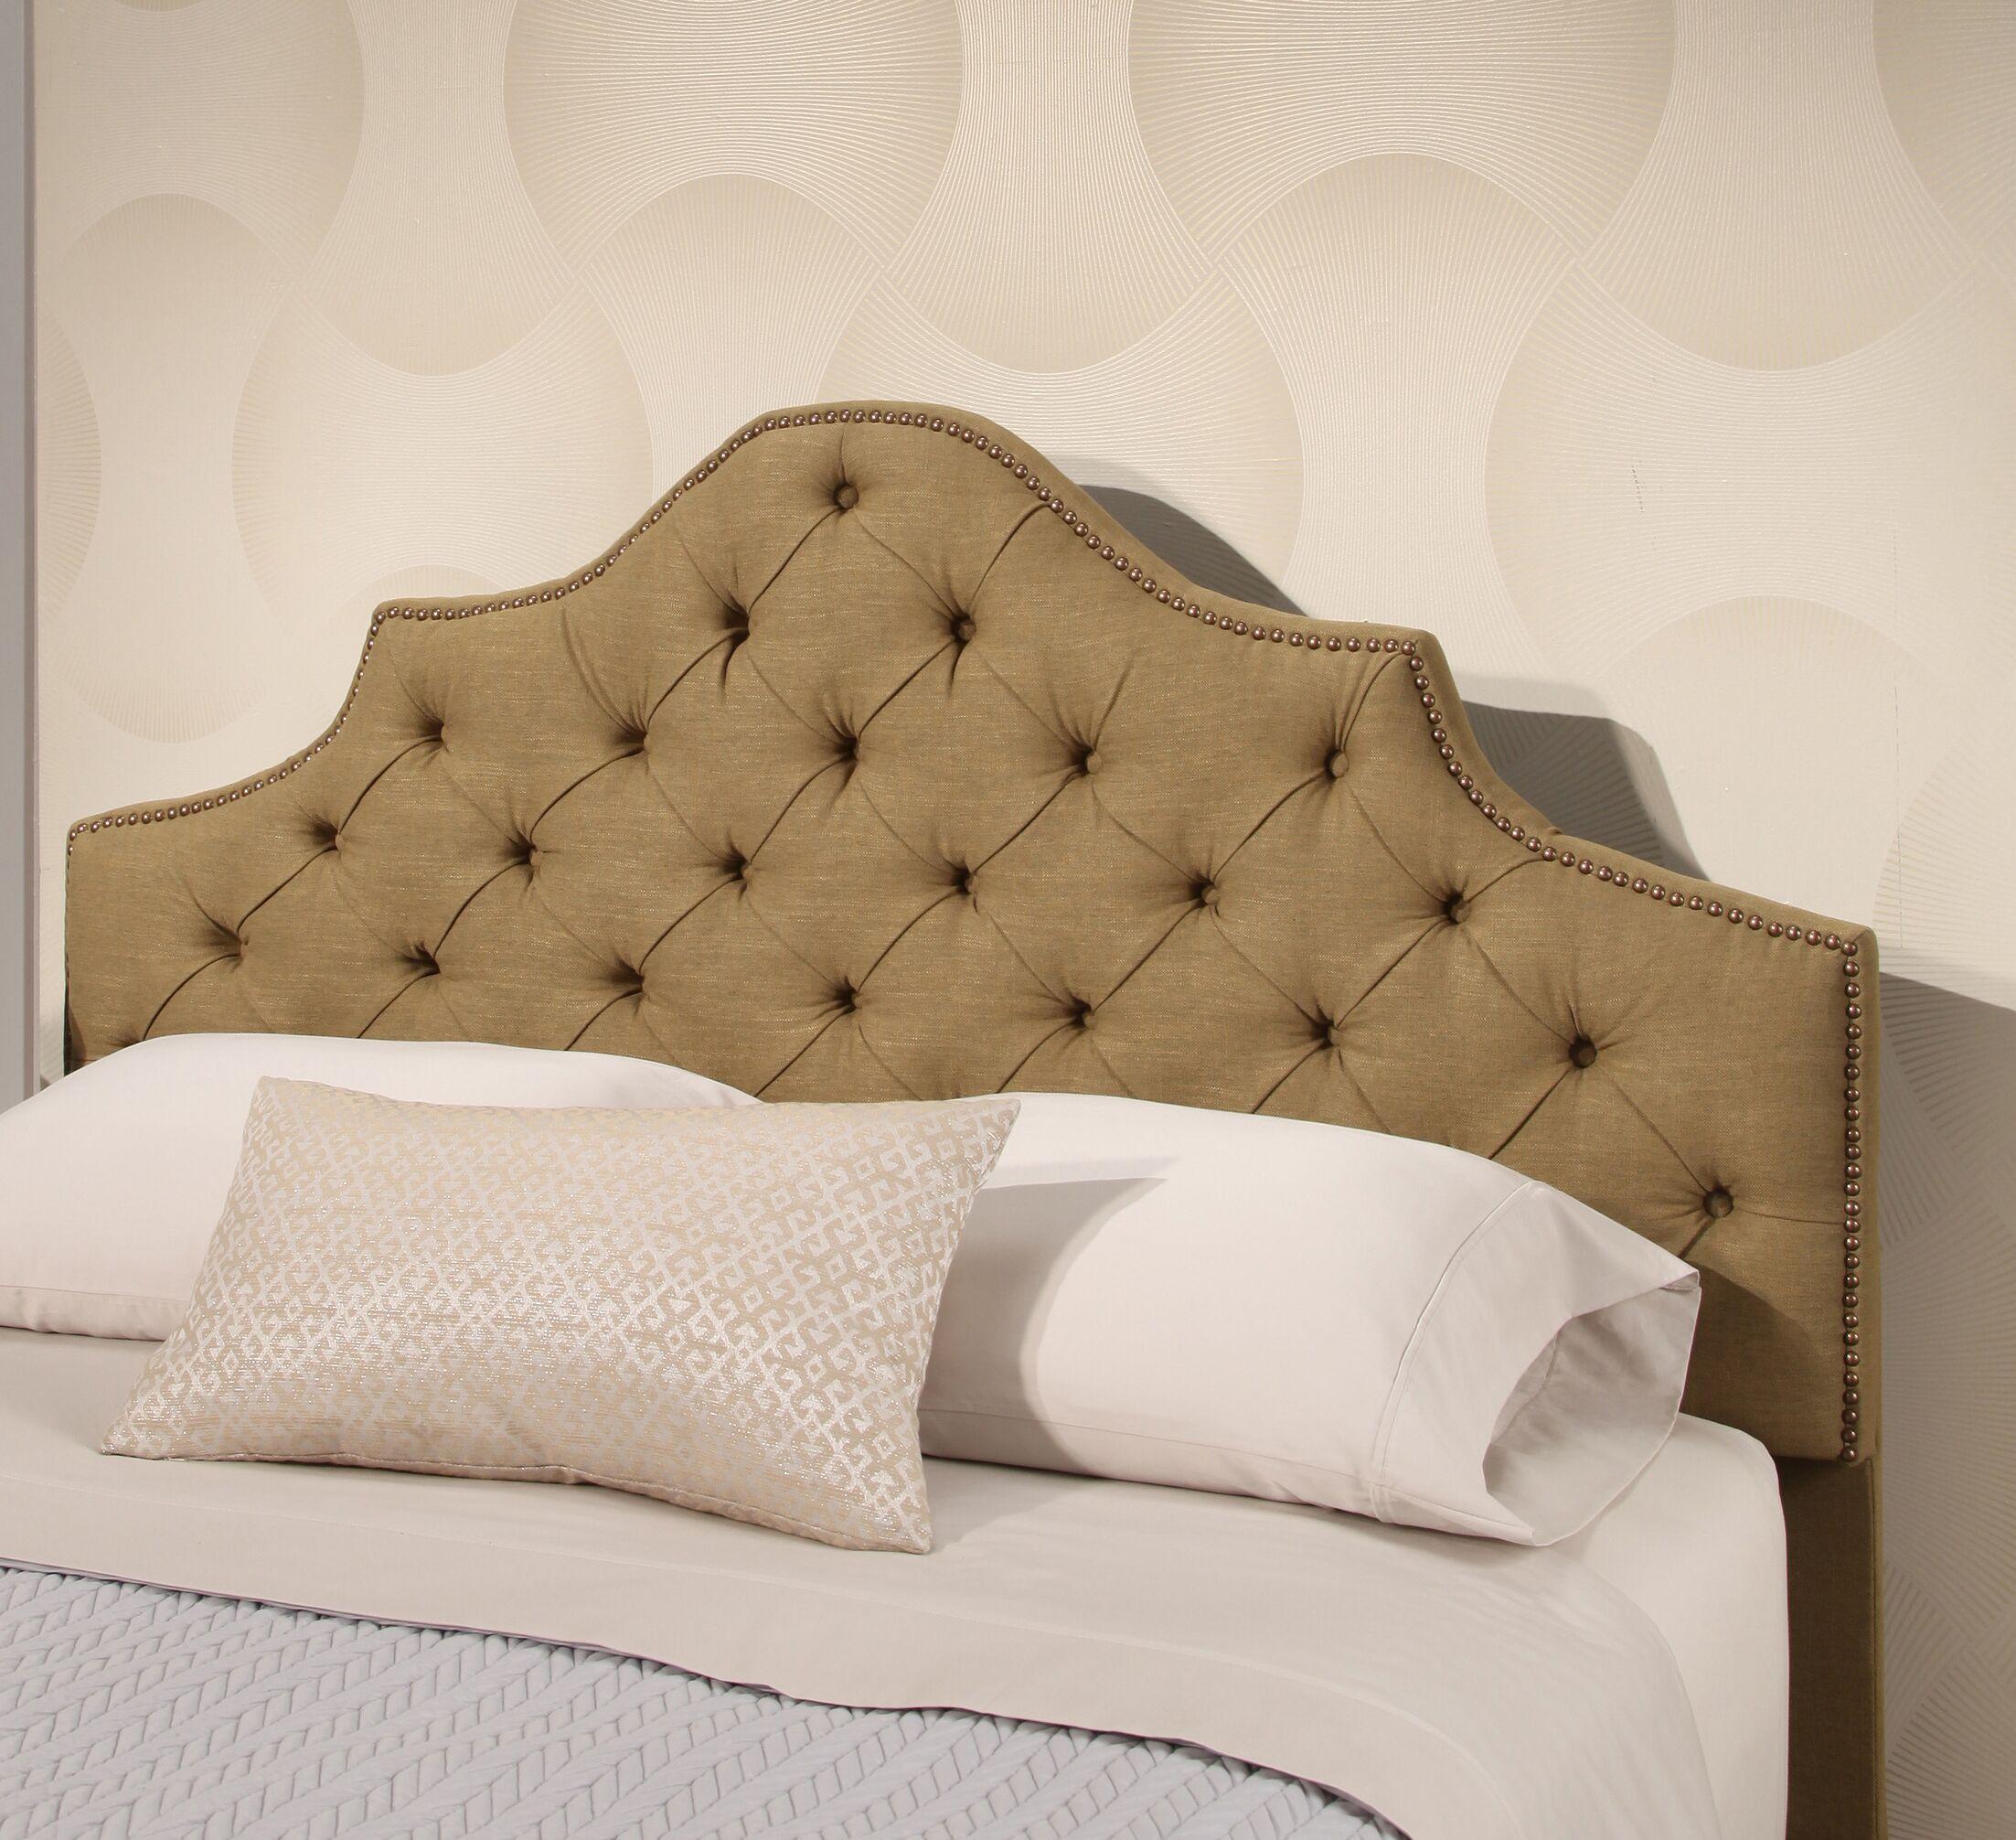 Lakeville Tufted Upholstered Panel Headboard Upholstery: Olive